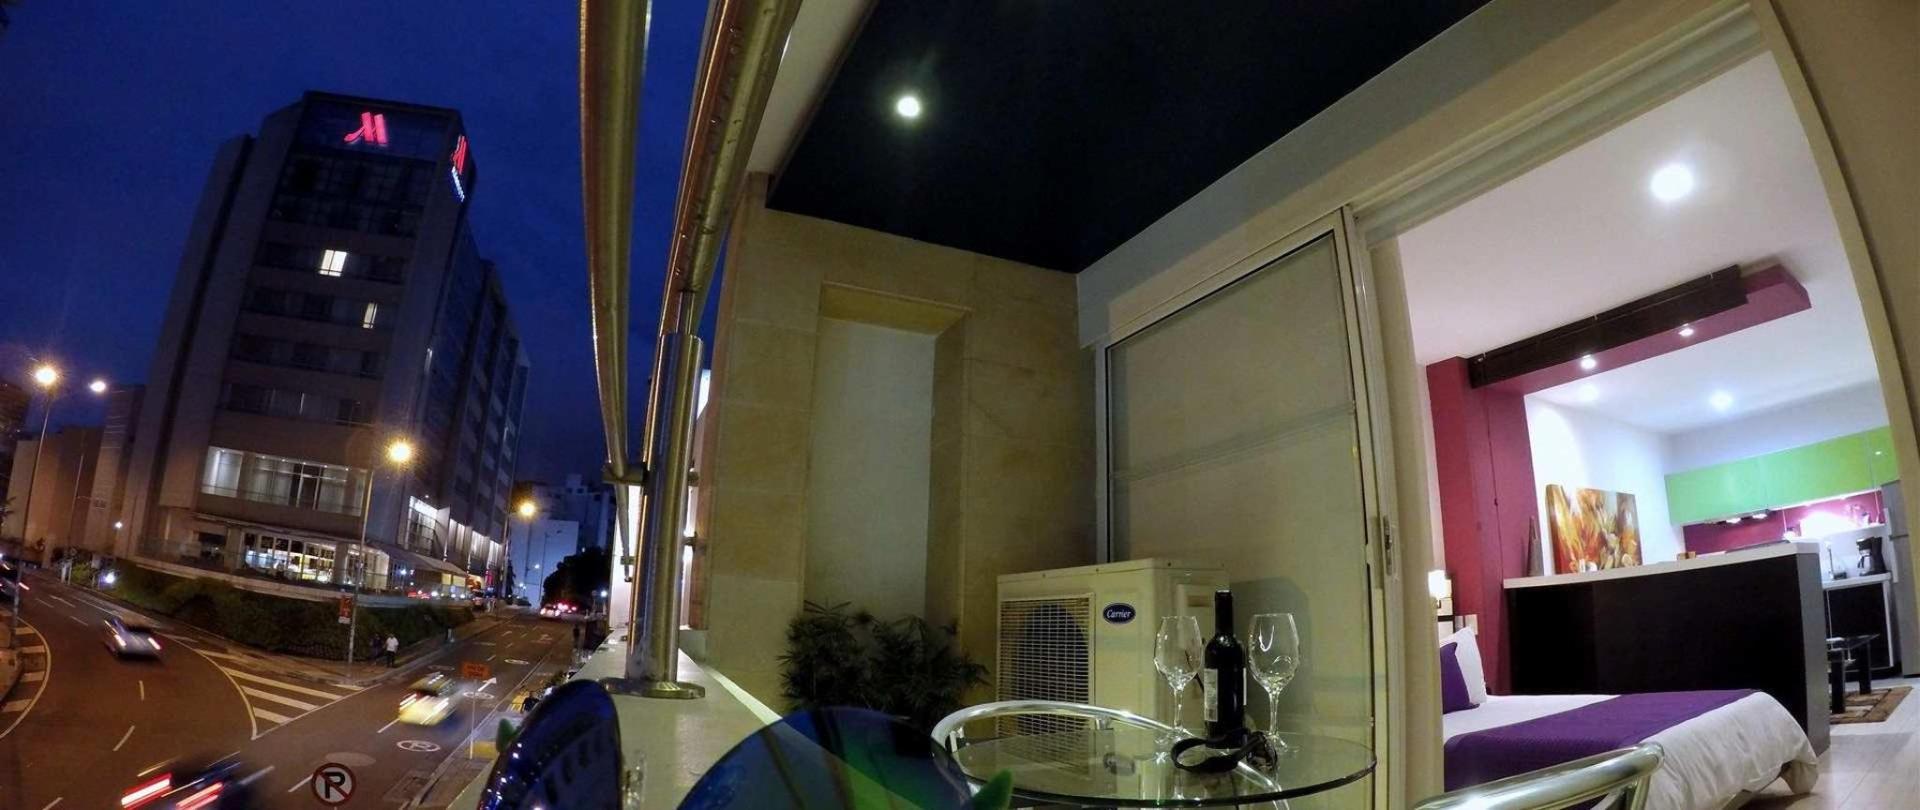 Room Loft Suite + balcony - Aqua Granada Hotel